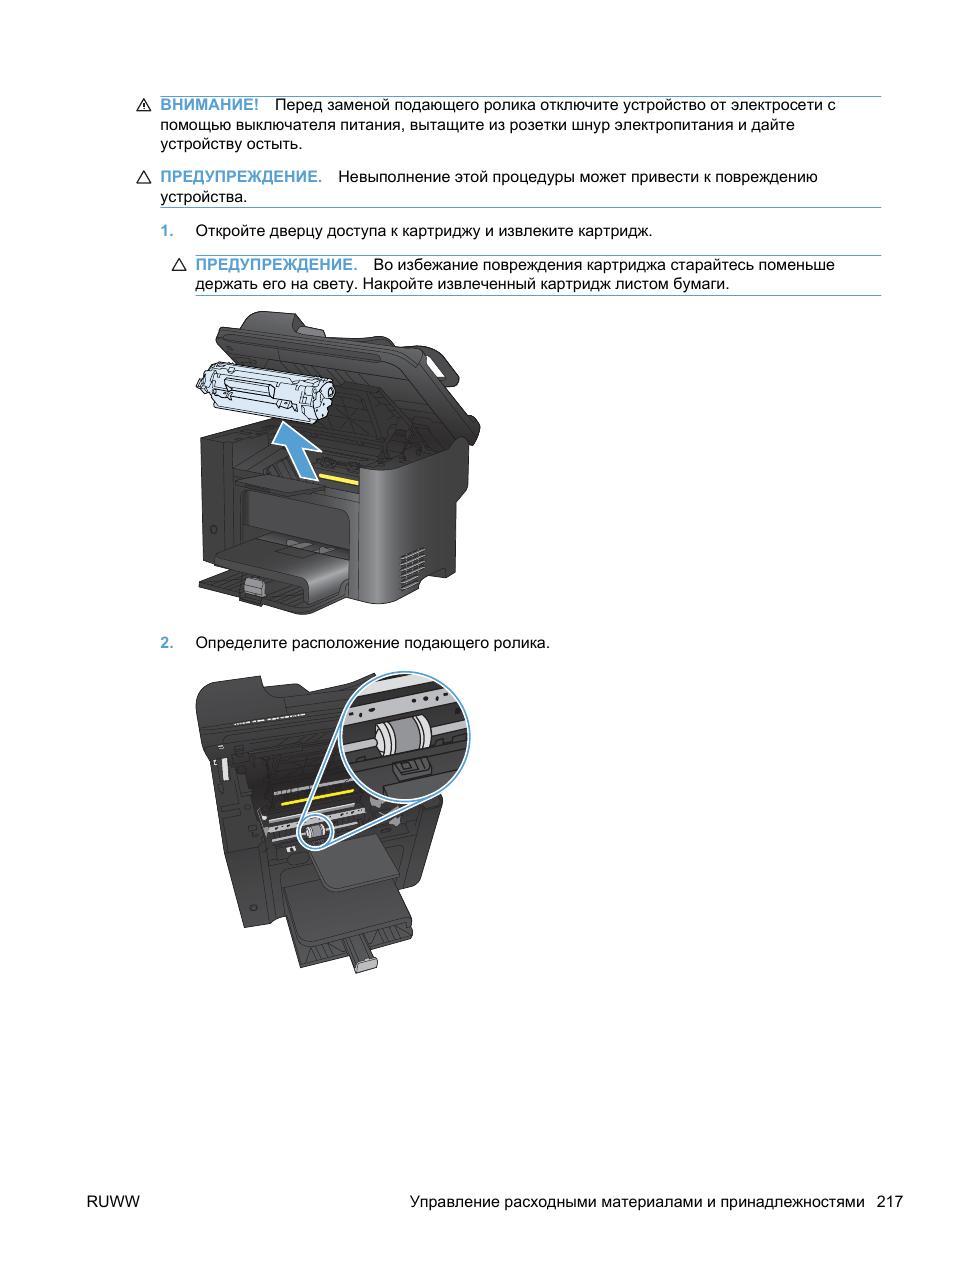 Инструкция по эксплуатации HP LaserJet Pro M1536dnf MFP SERIES Страница 231 / 322 Также для: LASERJET PRO M1530 MFP SERIES